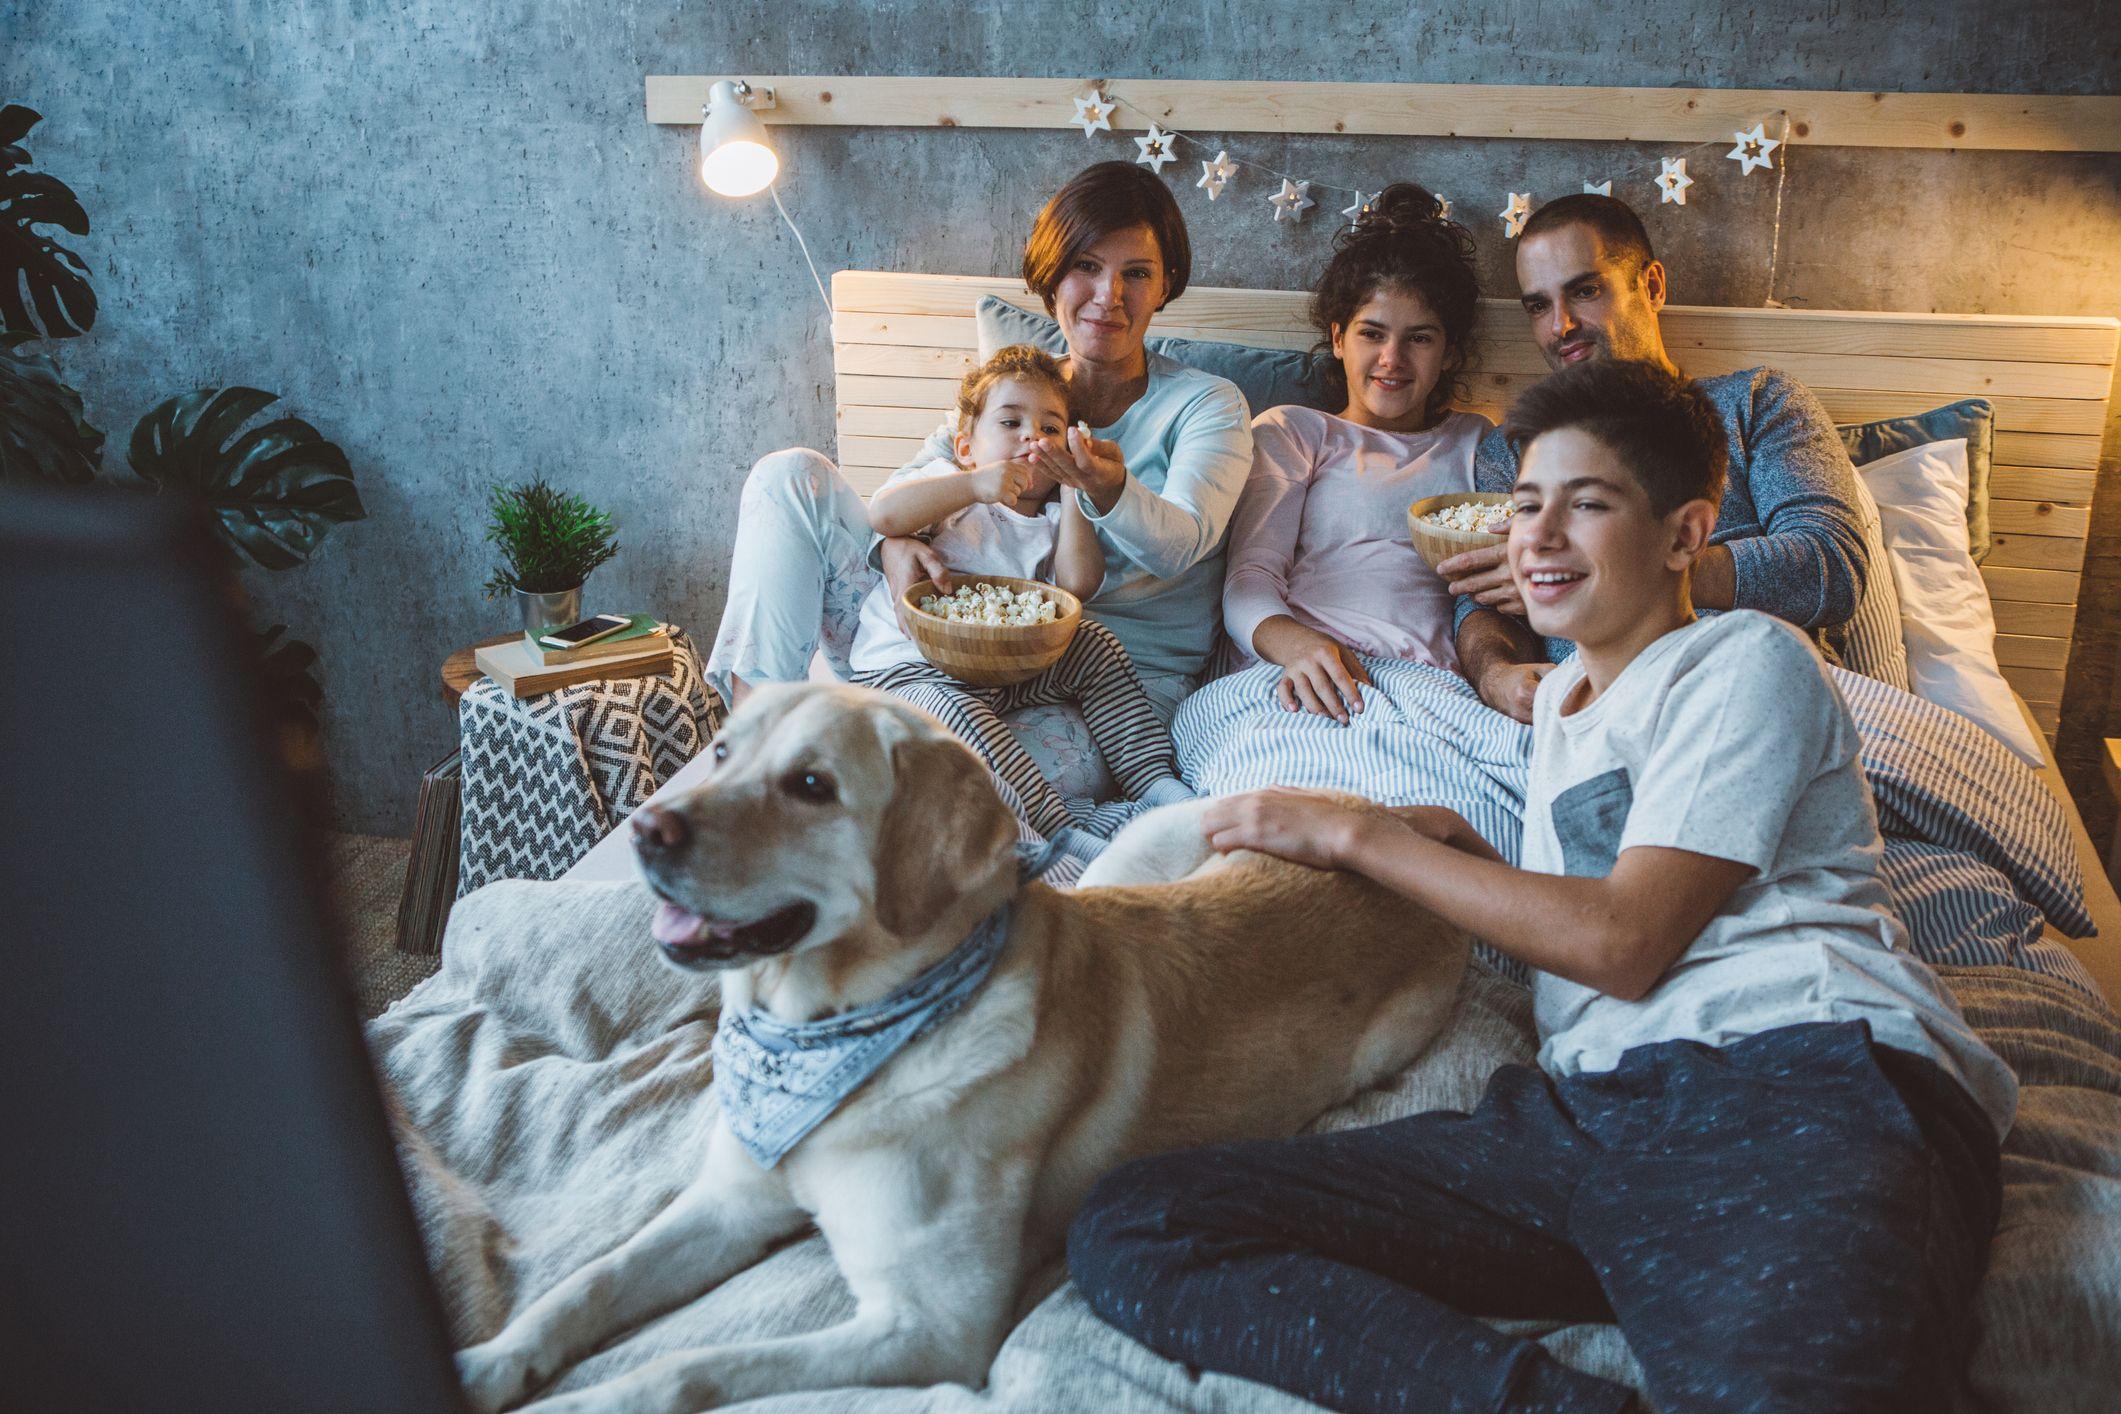 A family night ritual creates family fun and closeness